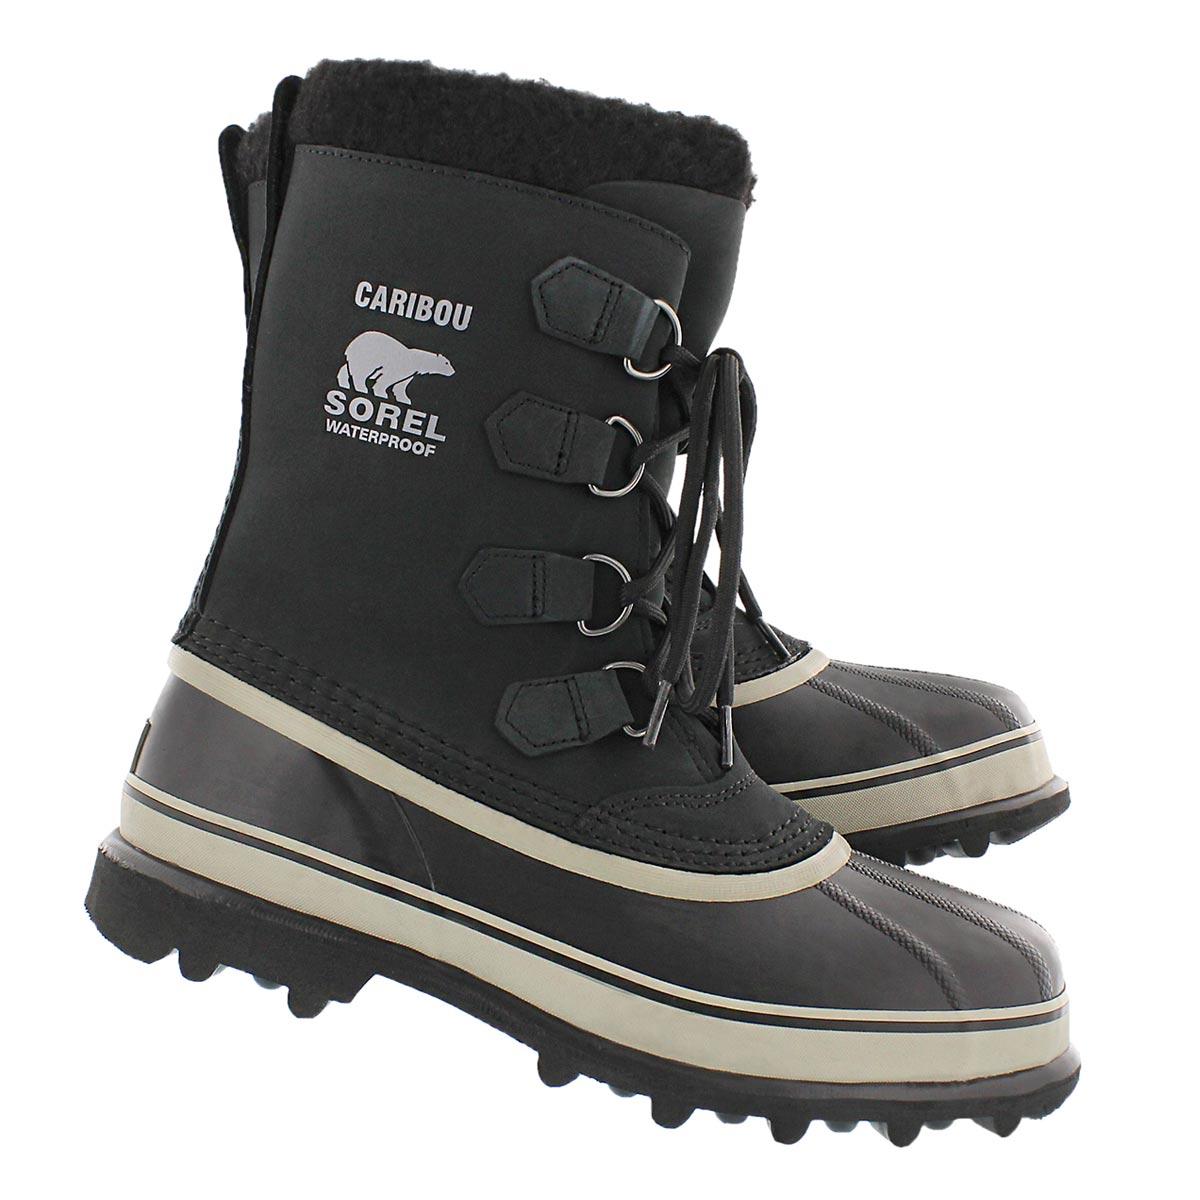 Mns Caribou blk/tusk nubuck pack boot